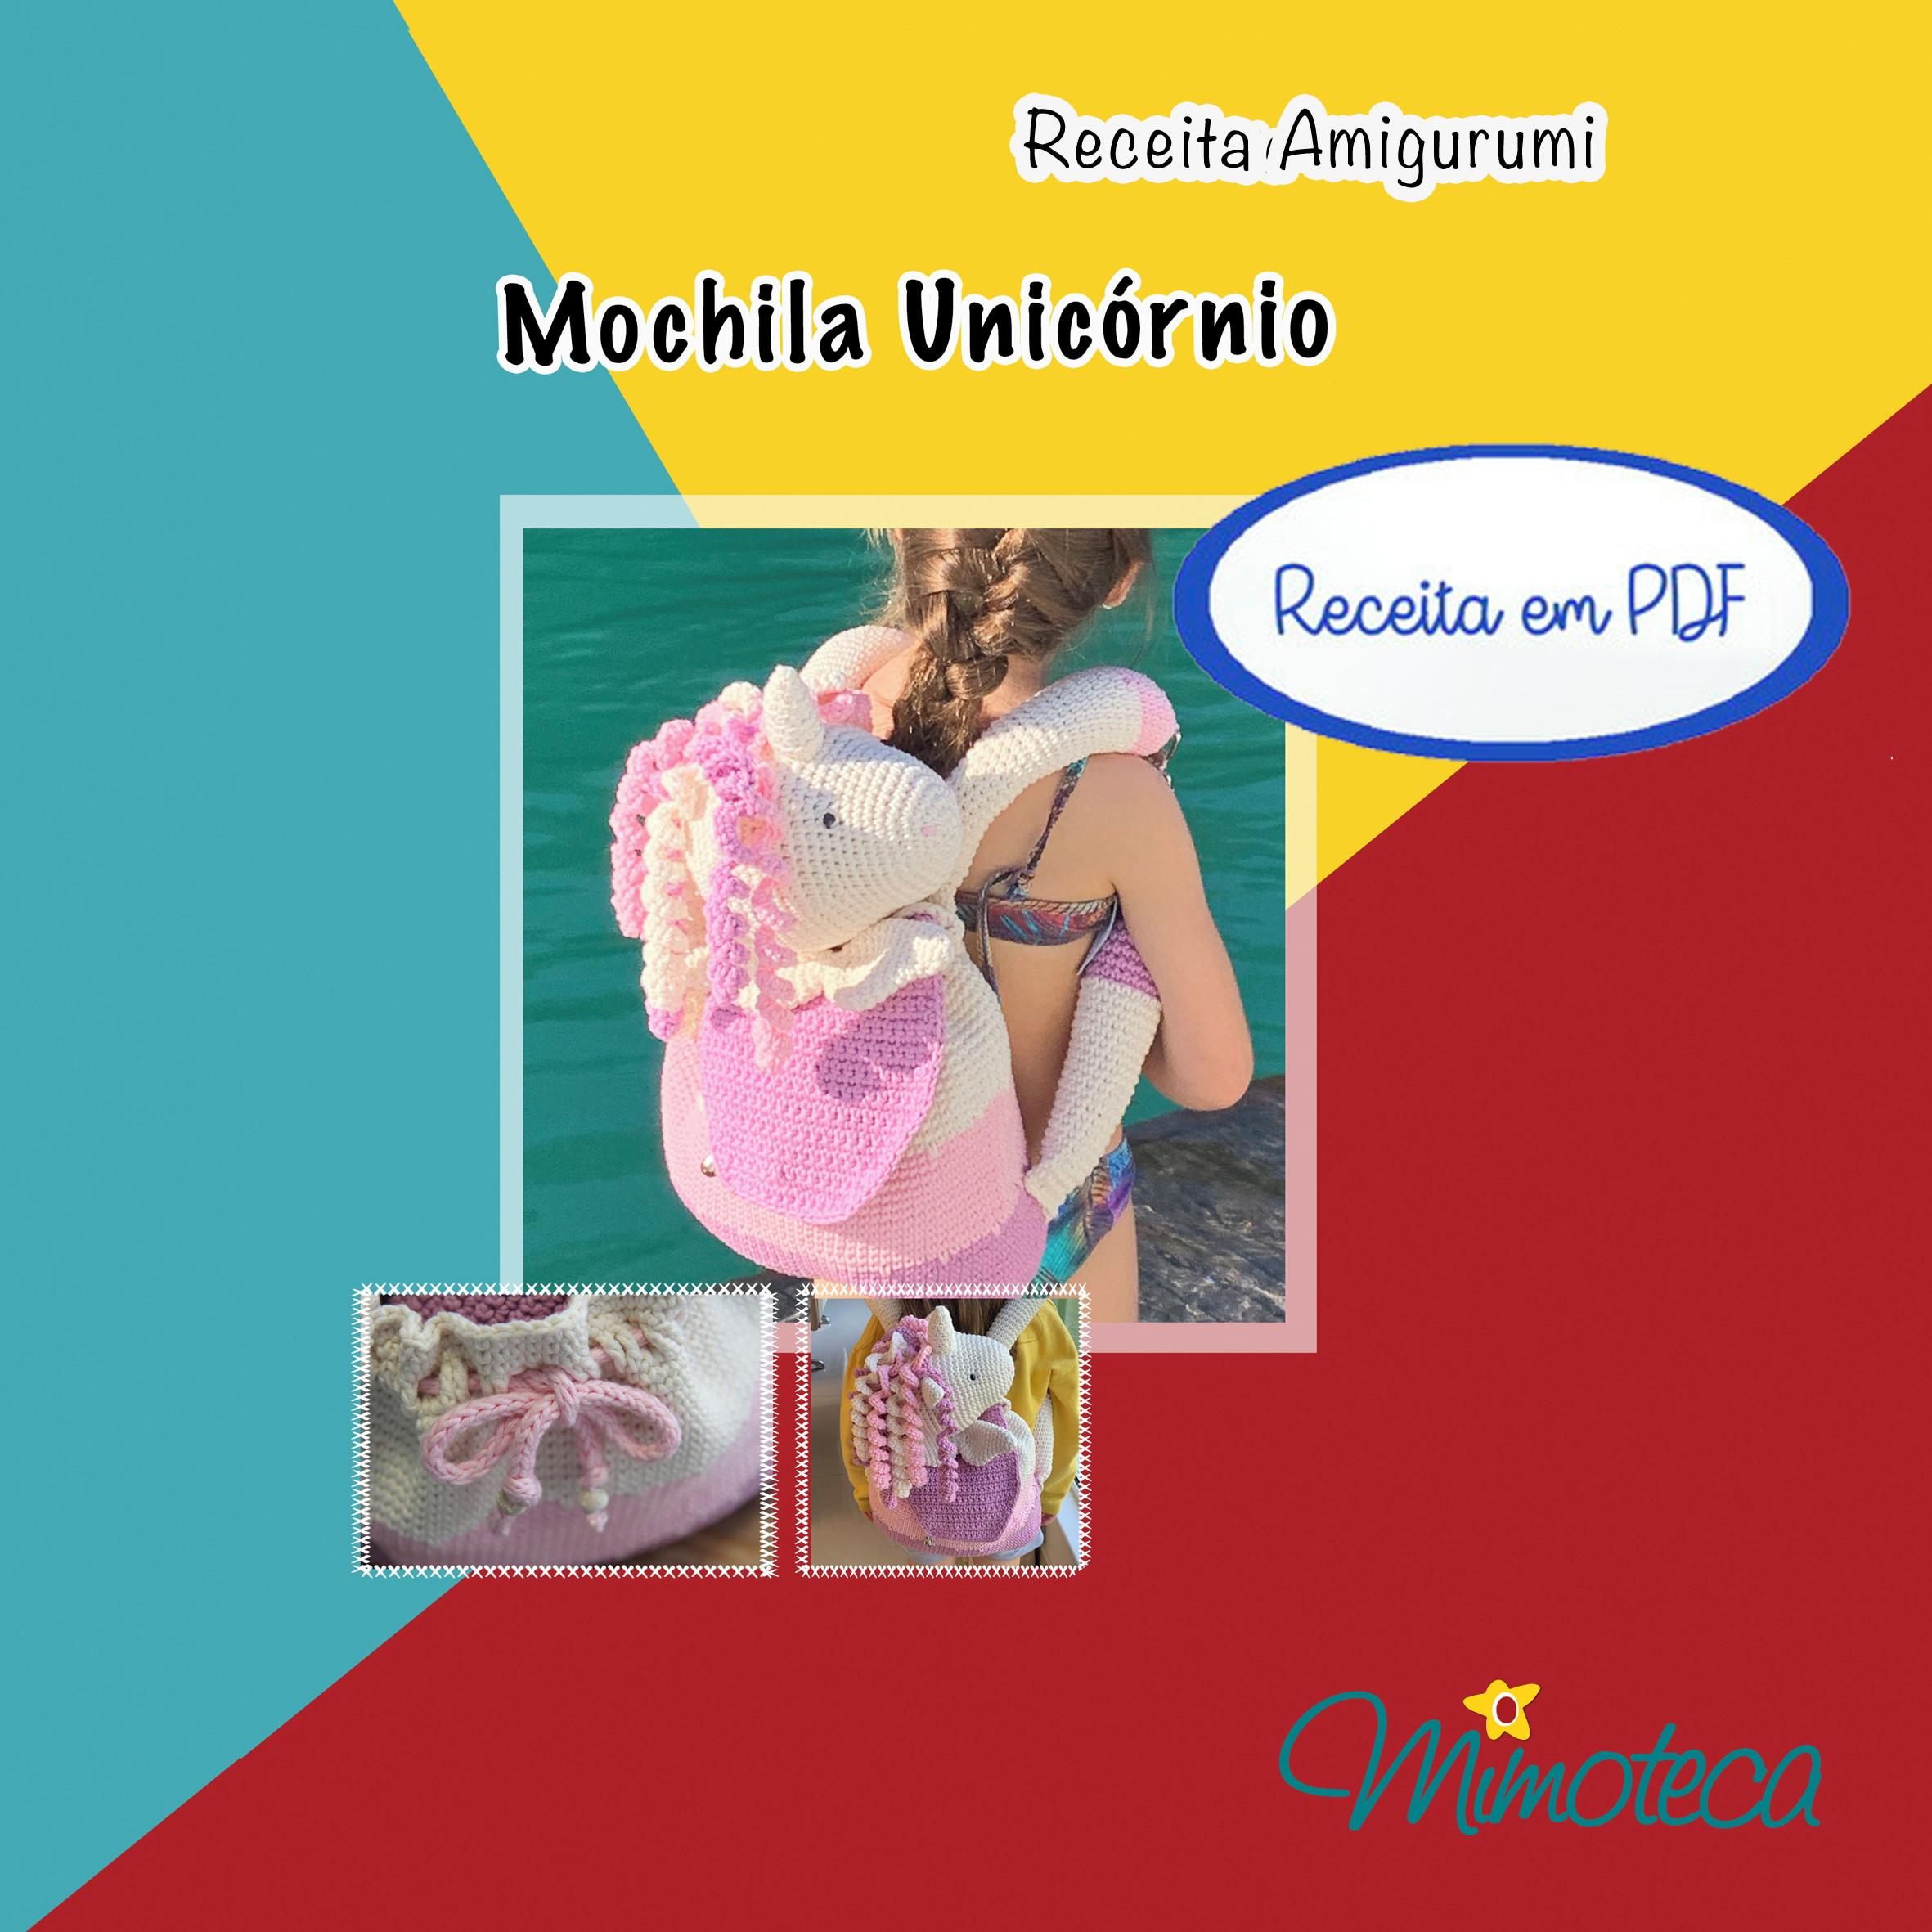 Kit Circulo Amigurumi 8 Unicornio - O Melhor Armarinho em Lãs ... | 2362x2362